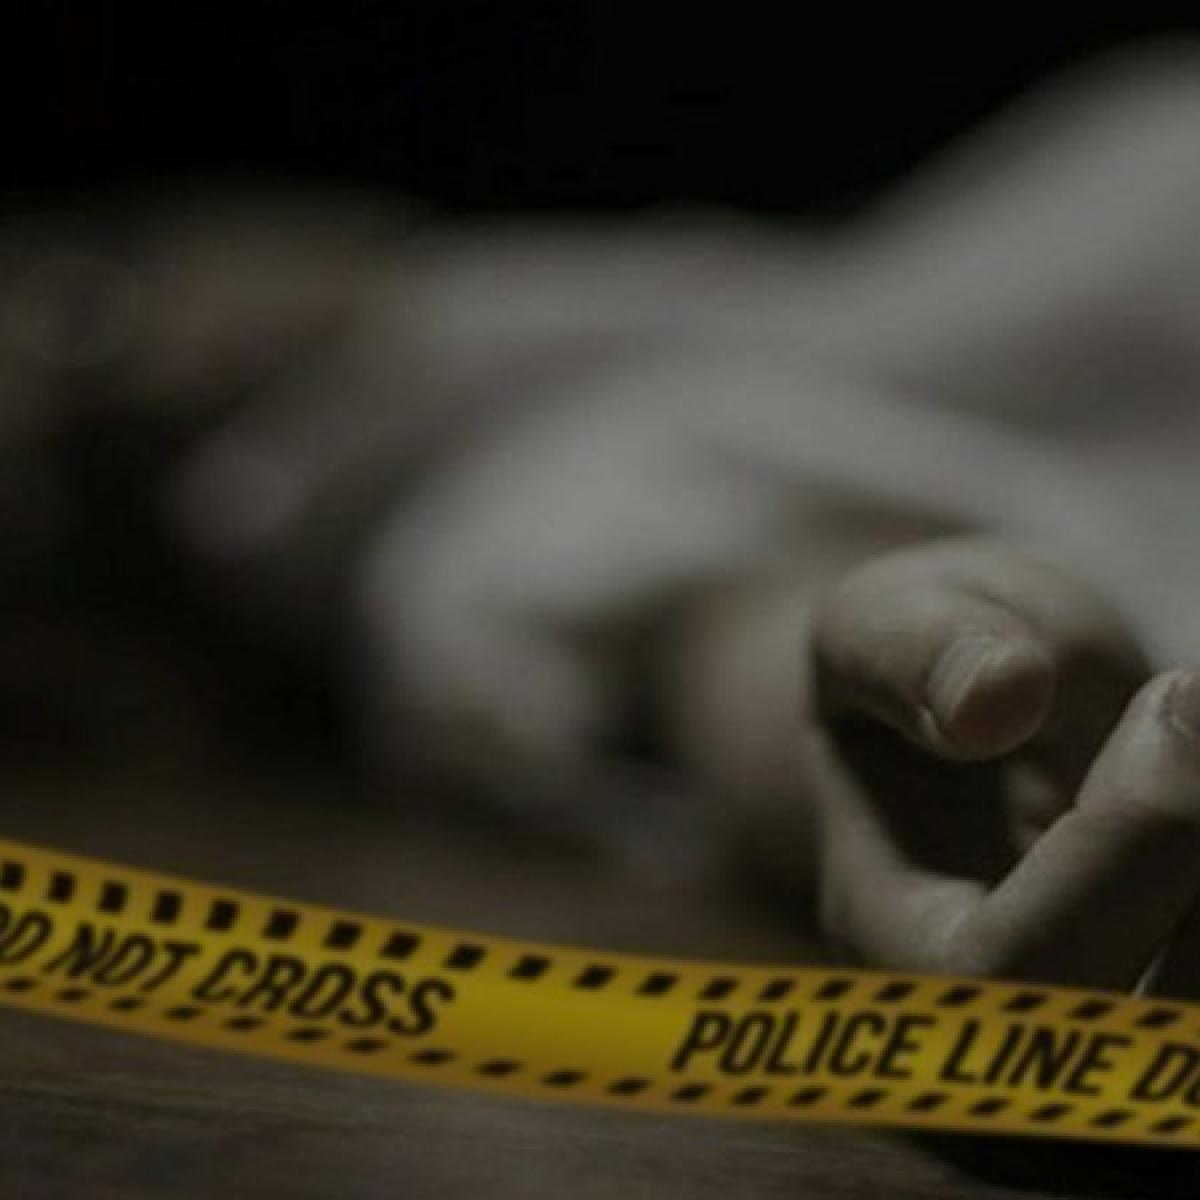 Man held for wife's murder in Ghaziabad